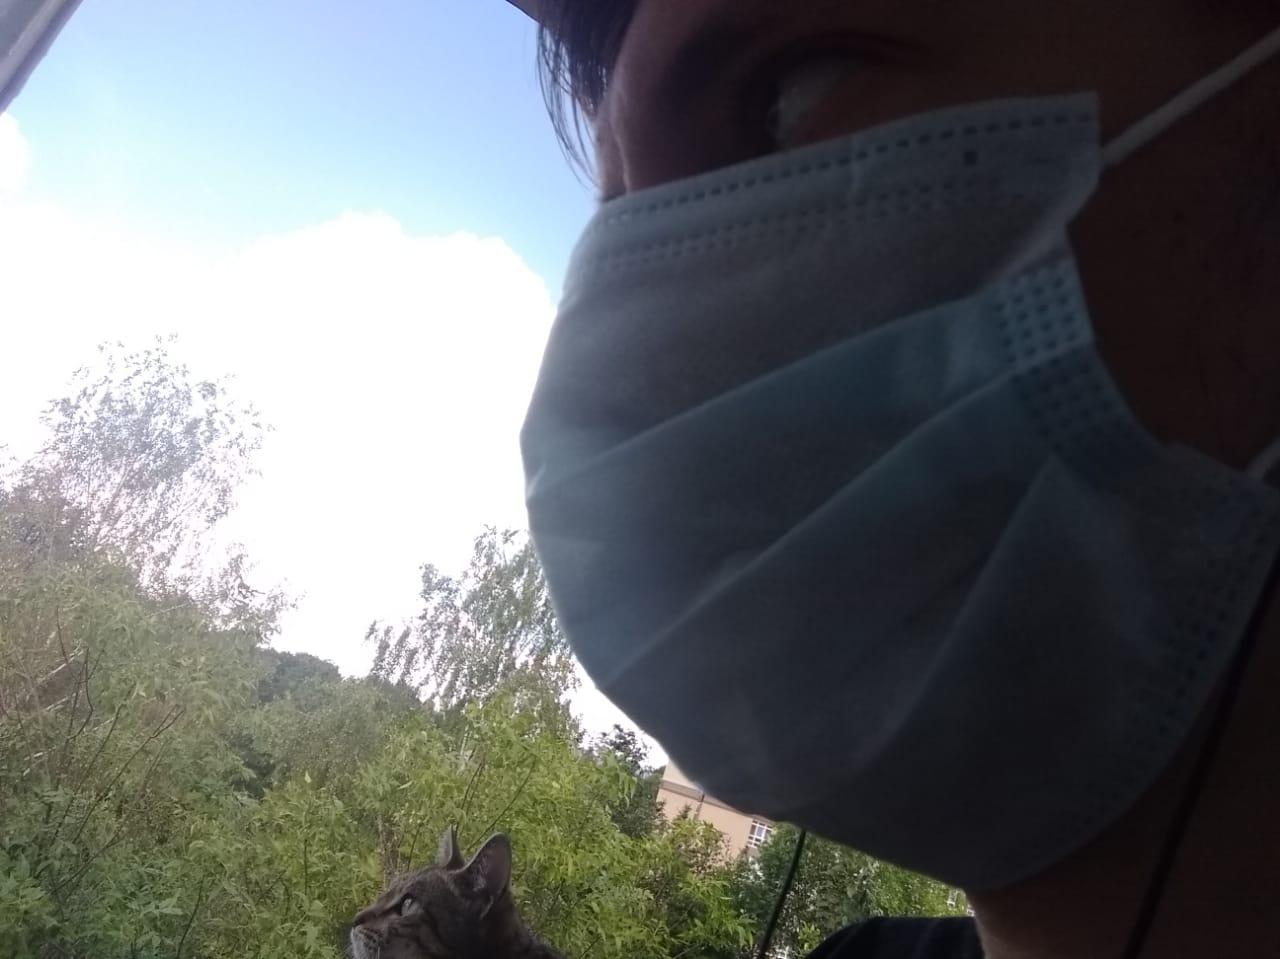 Еще 25 человек «подхватили» коронавирус на 7 августа